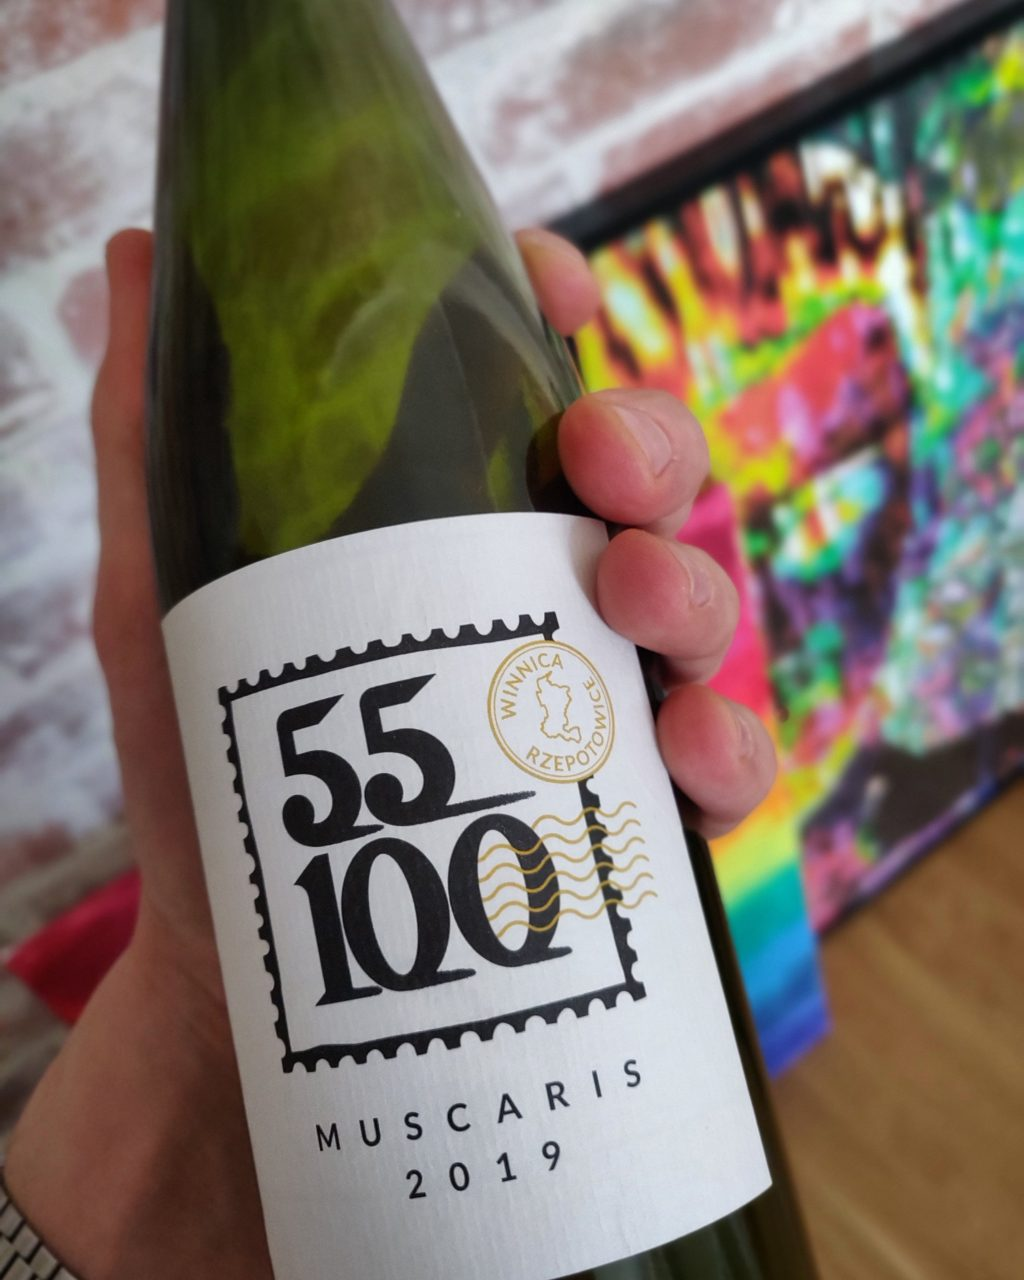 55-100 Muscaris